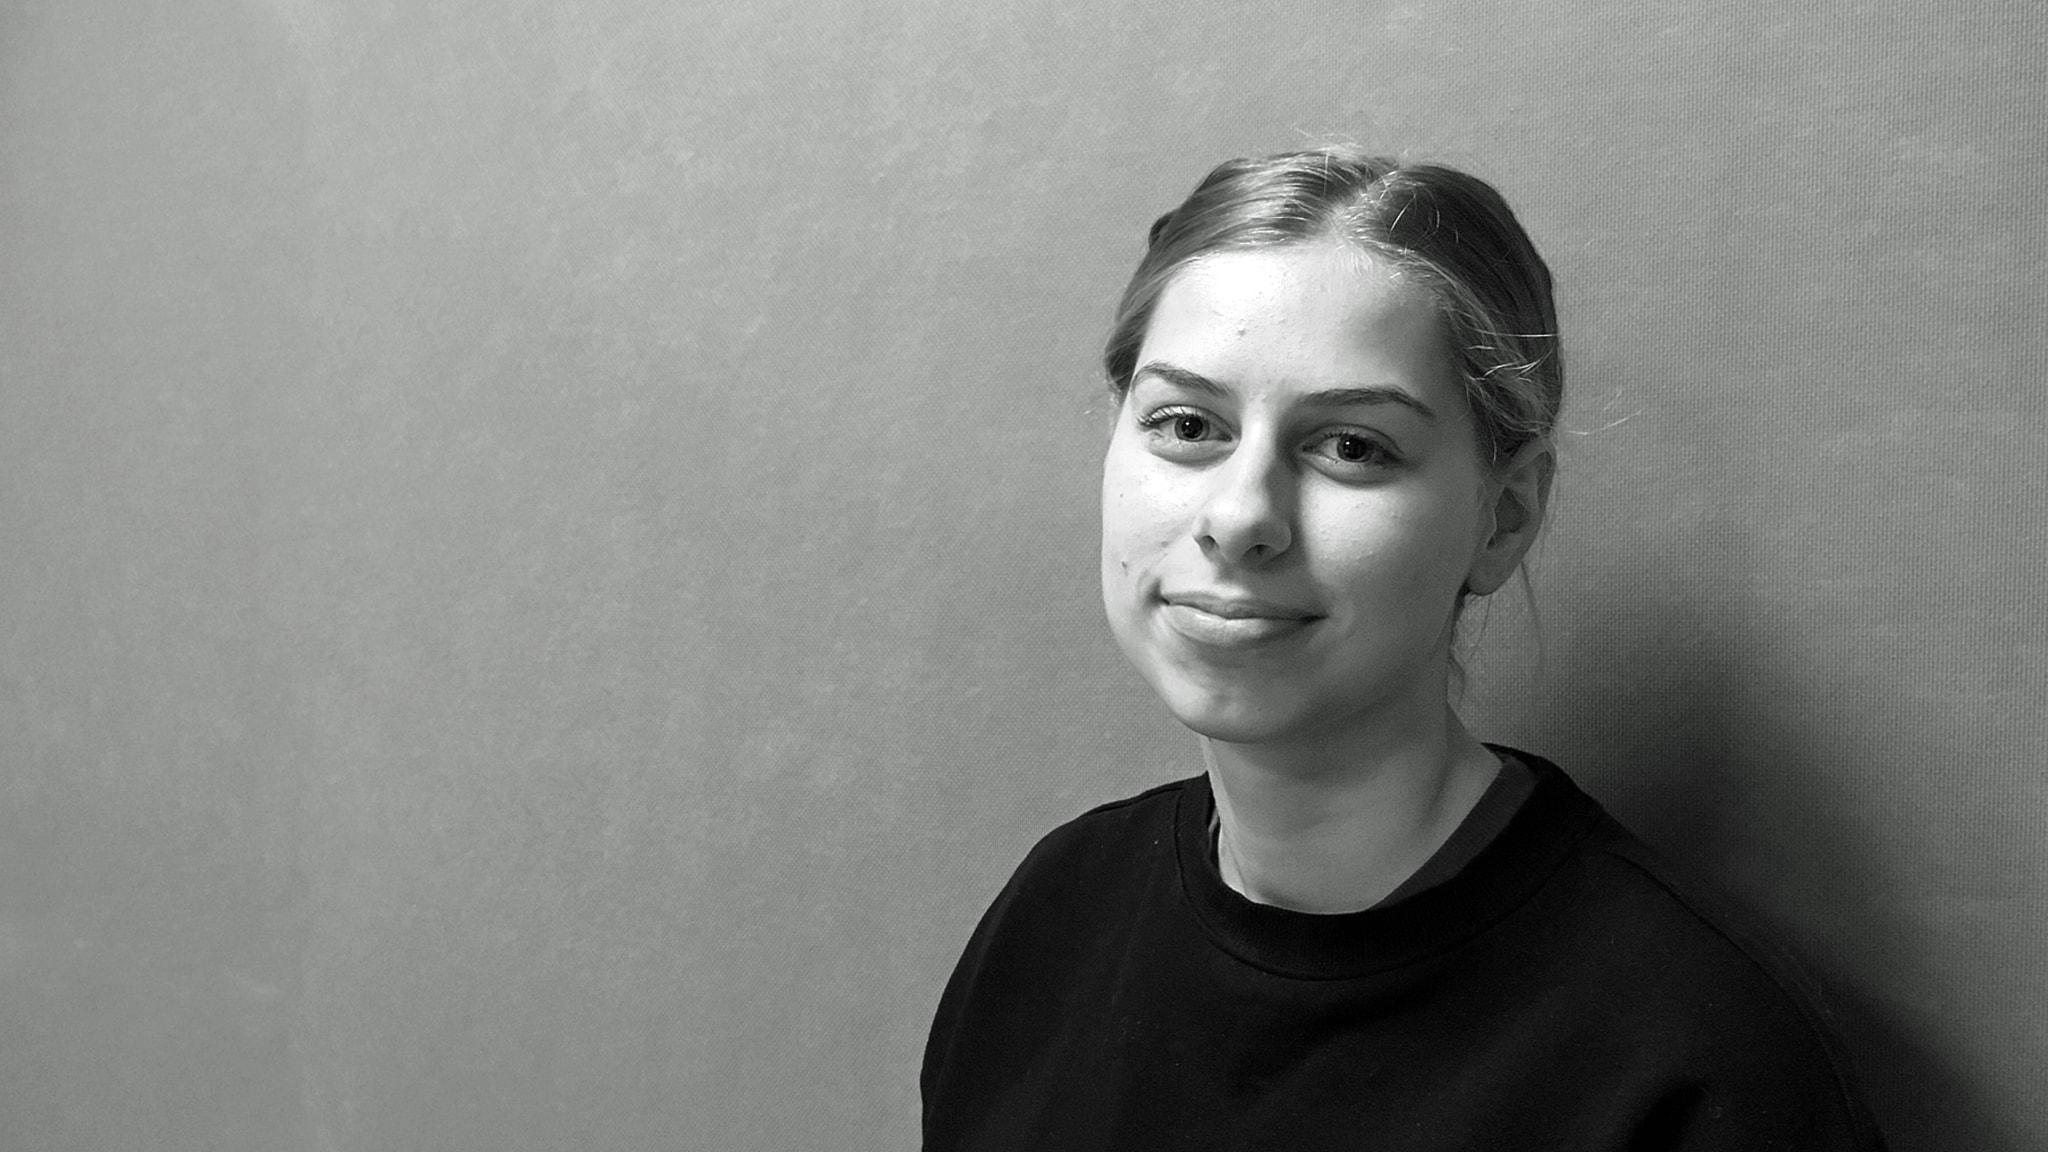 Sofia Stjernfelt